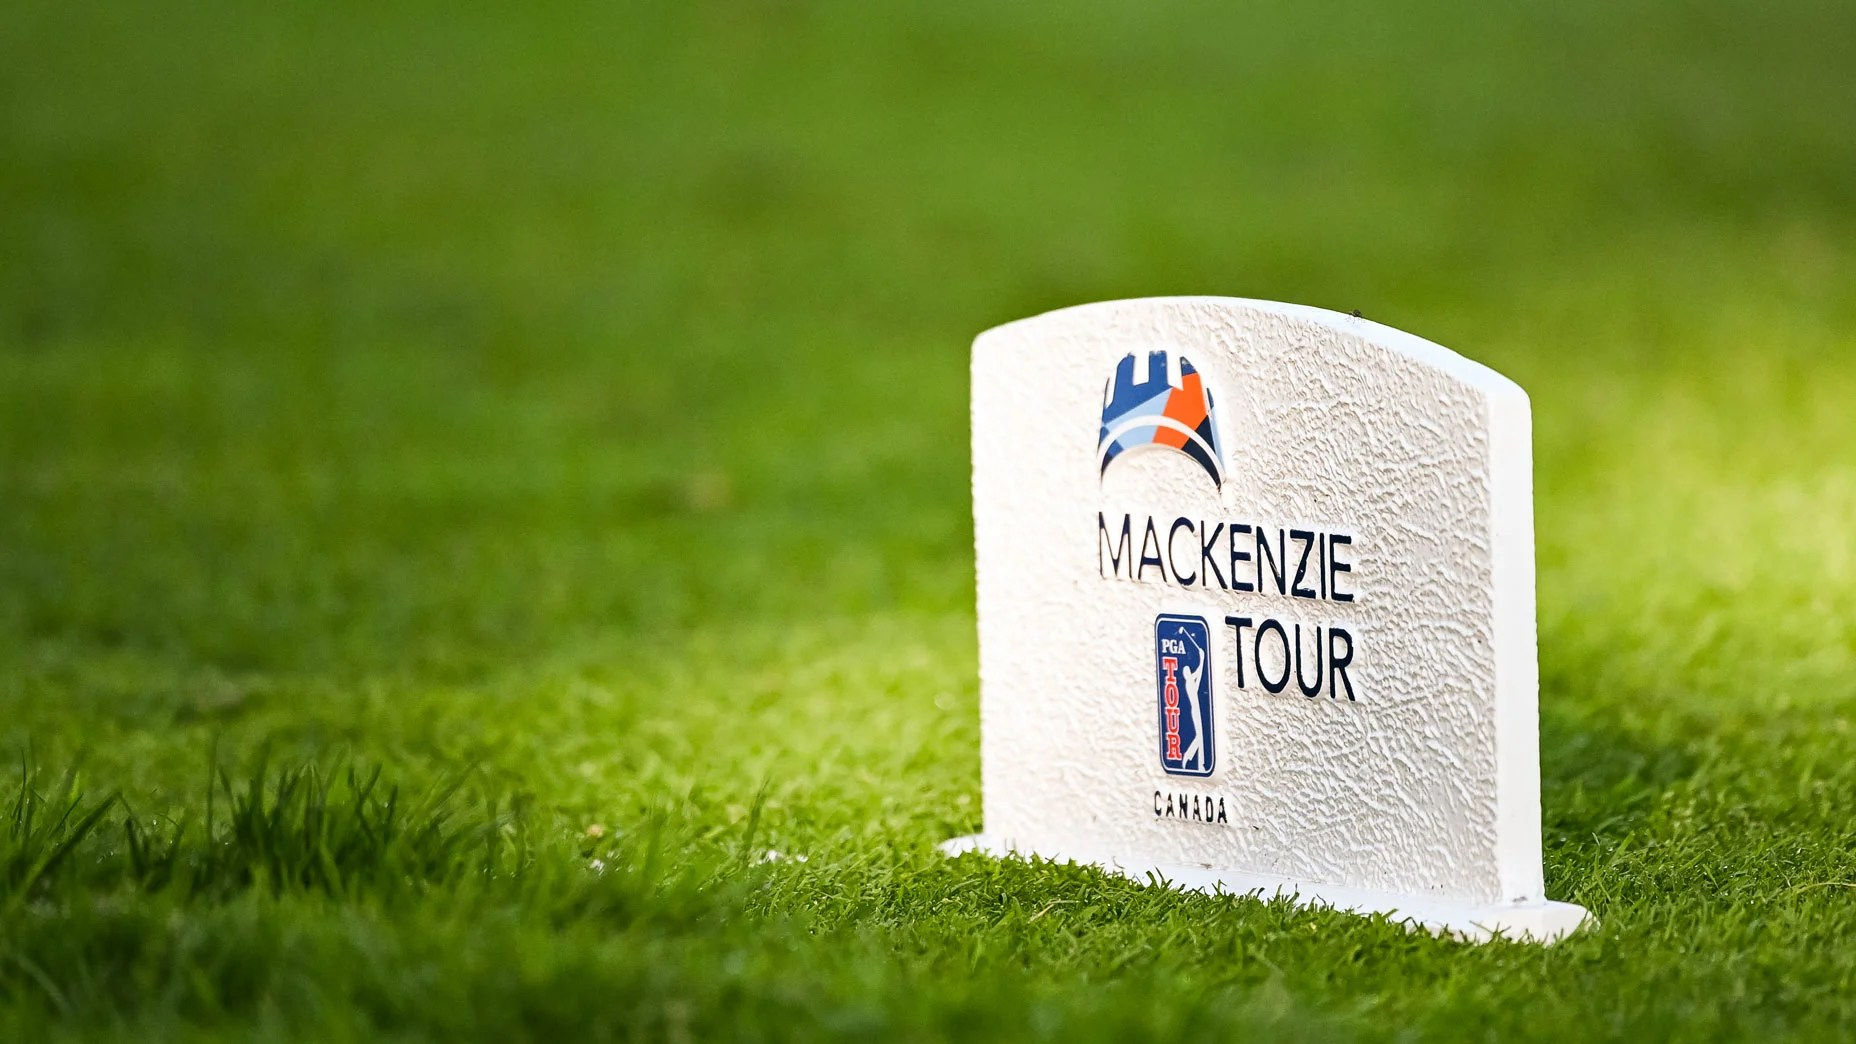 A tee marker with the Mackenzie Tour - PGA Tour Canada logo.